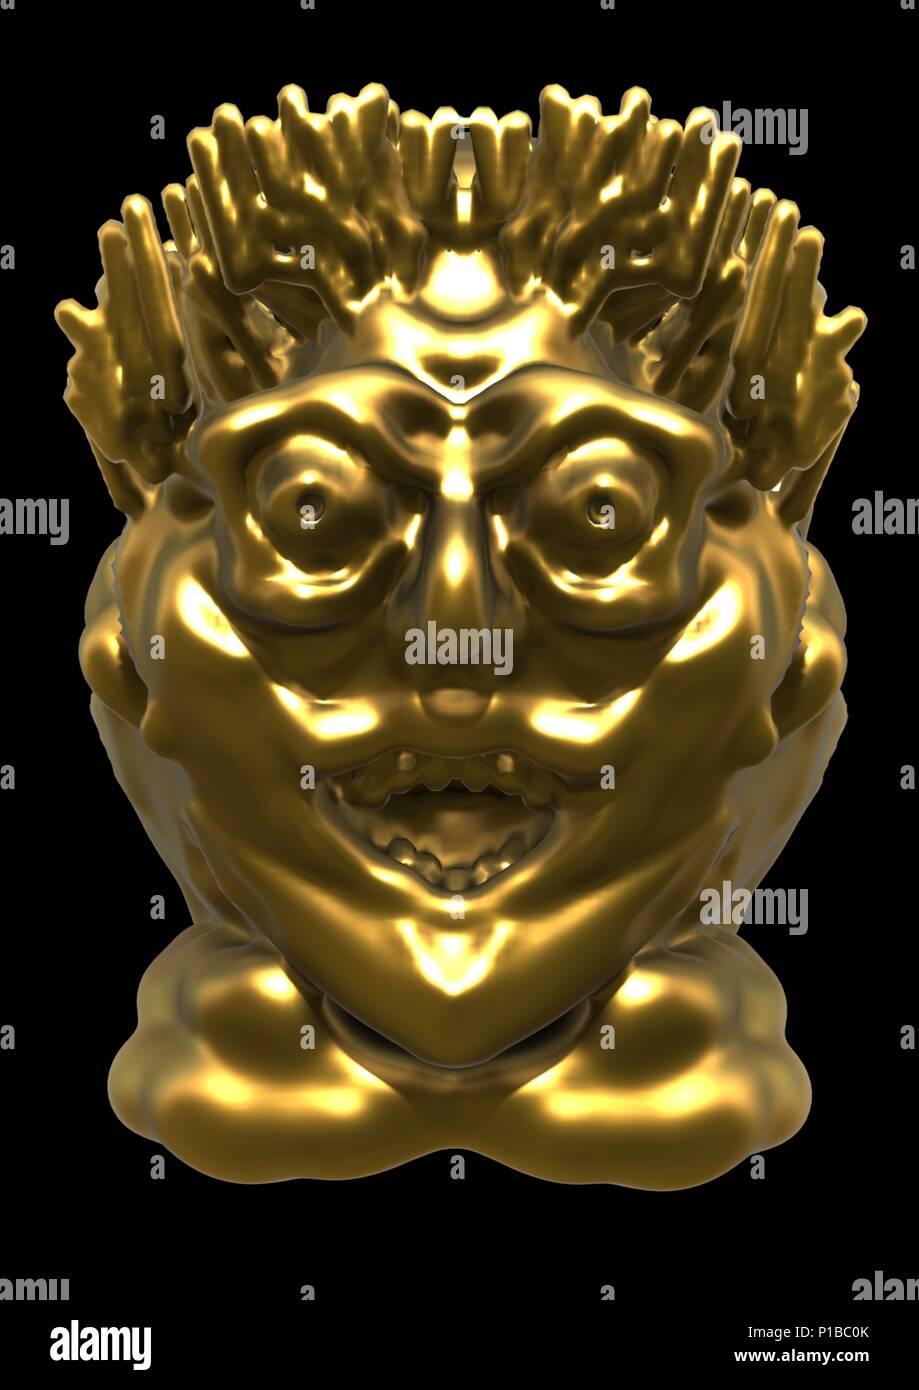 golden idol - Stock Image